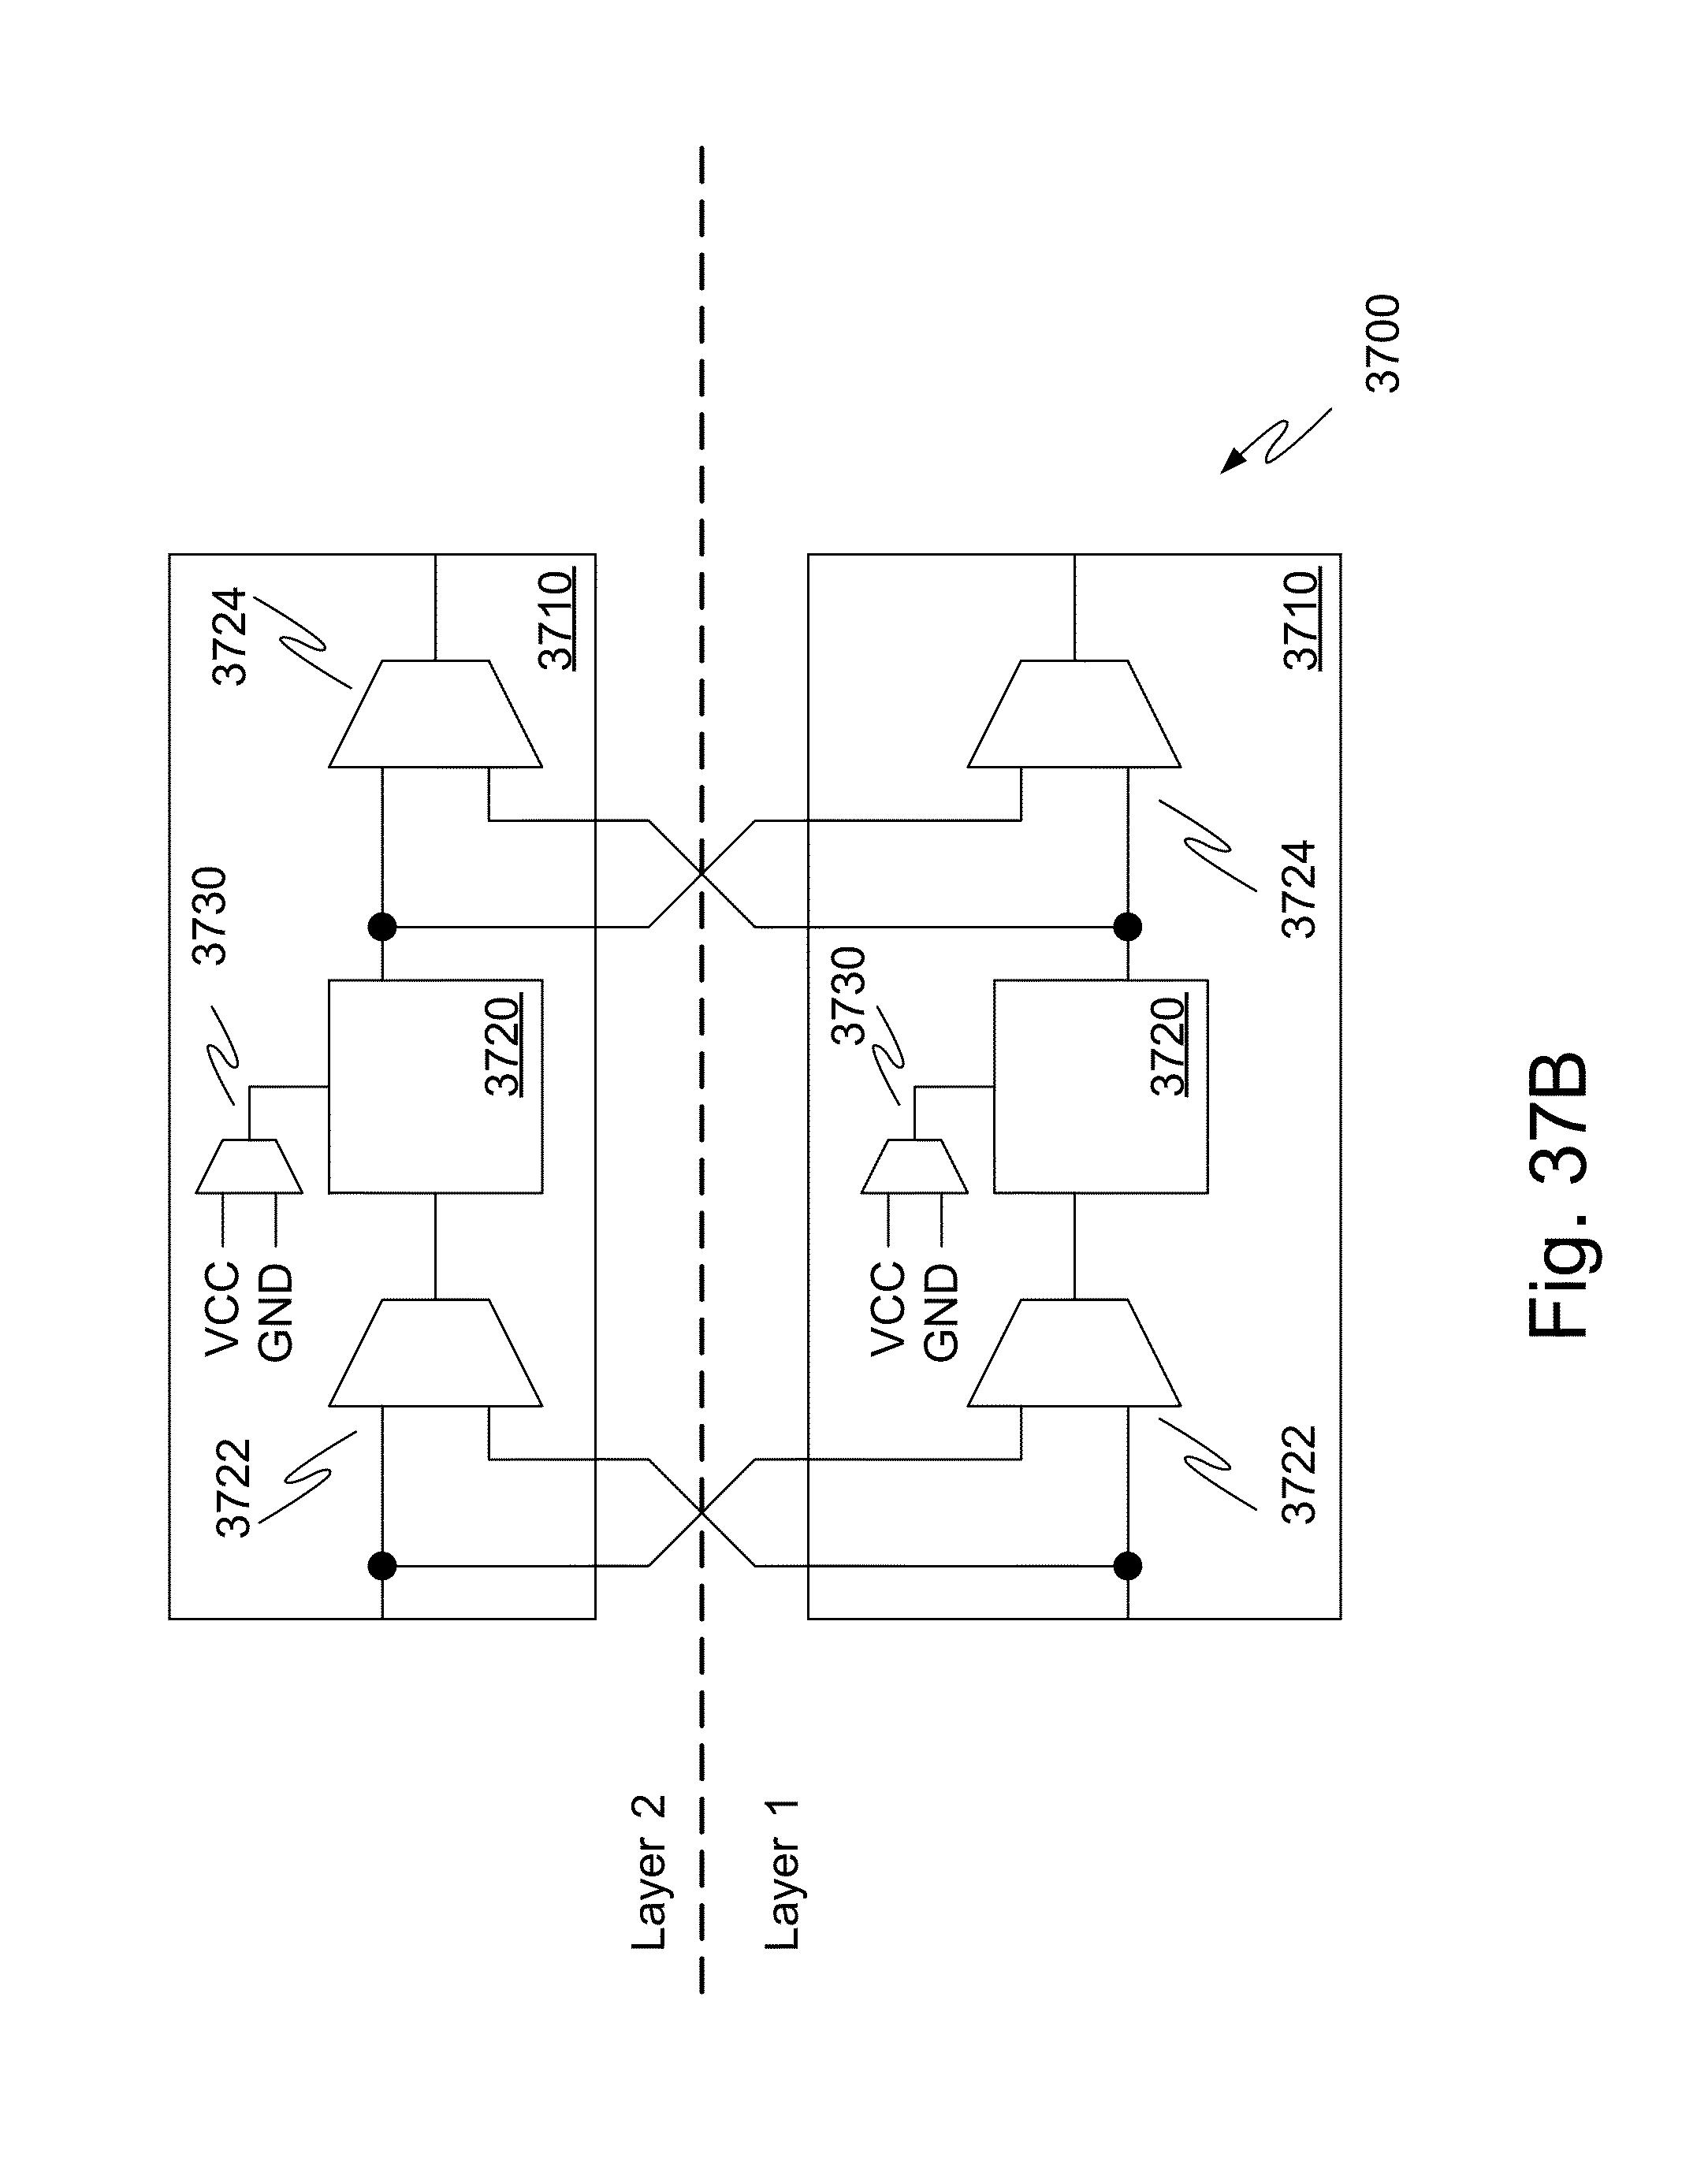 international 2654 wiring diagram on